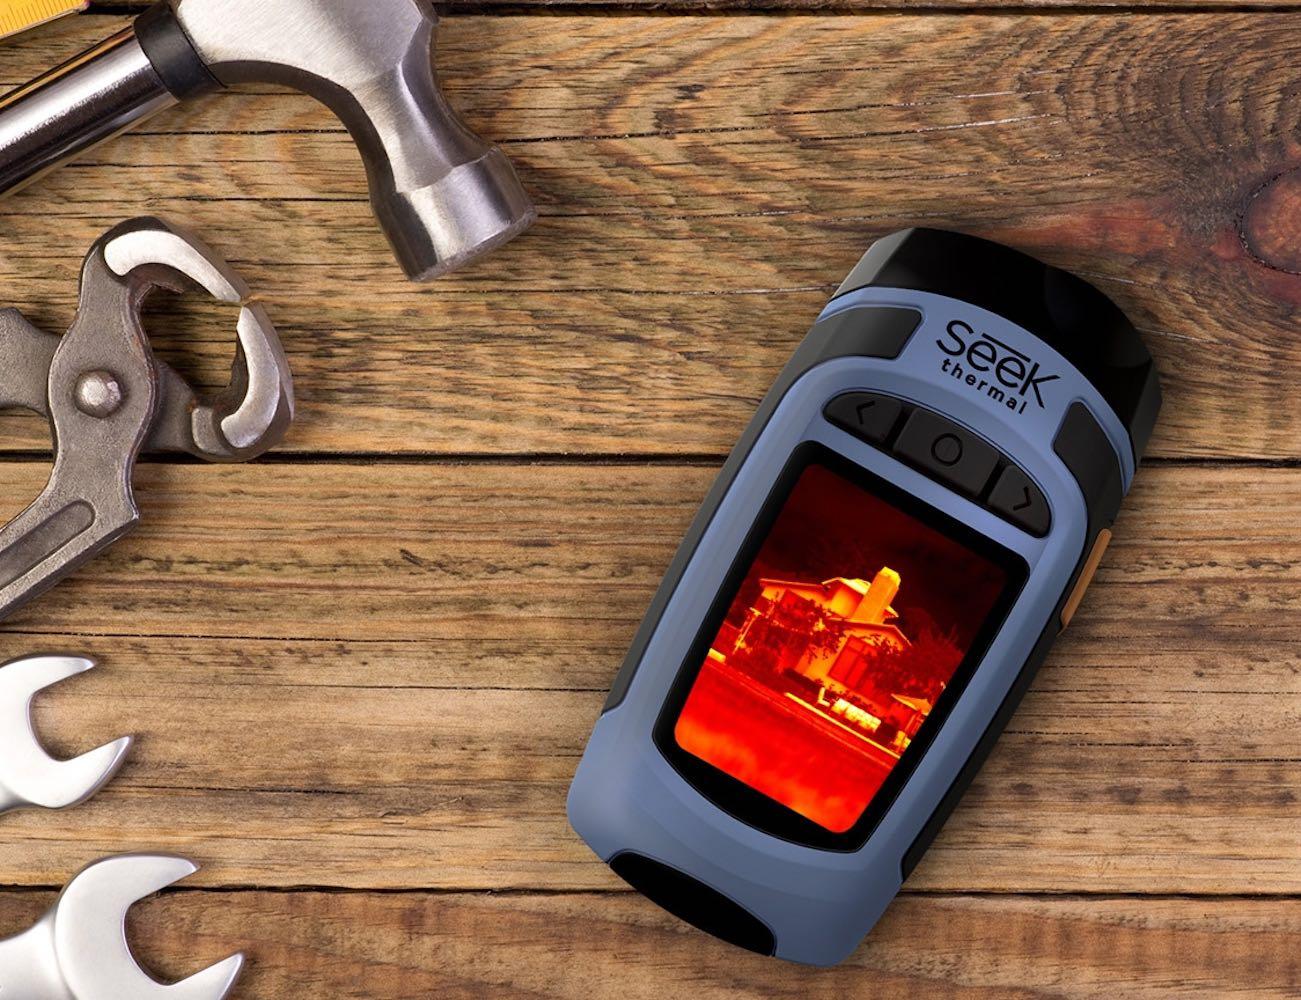 Seek Reveal Handheld Thermal Imager and Spotlight